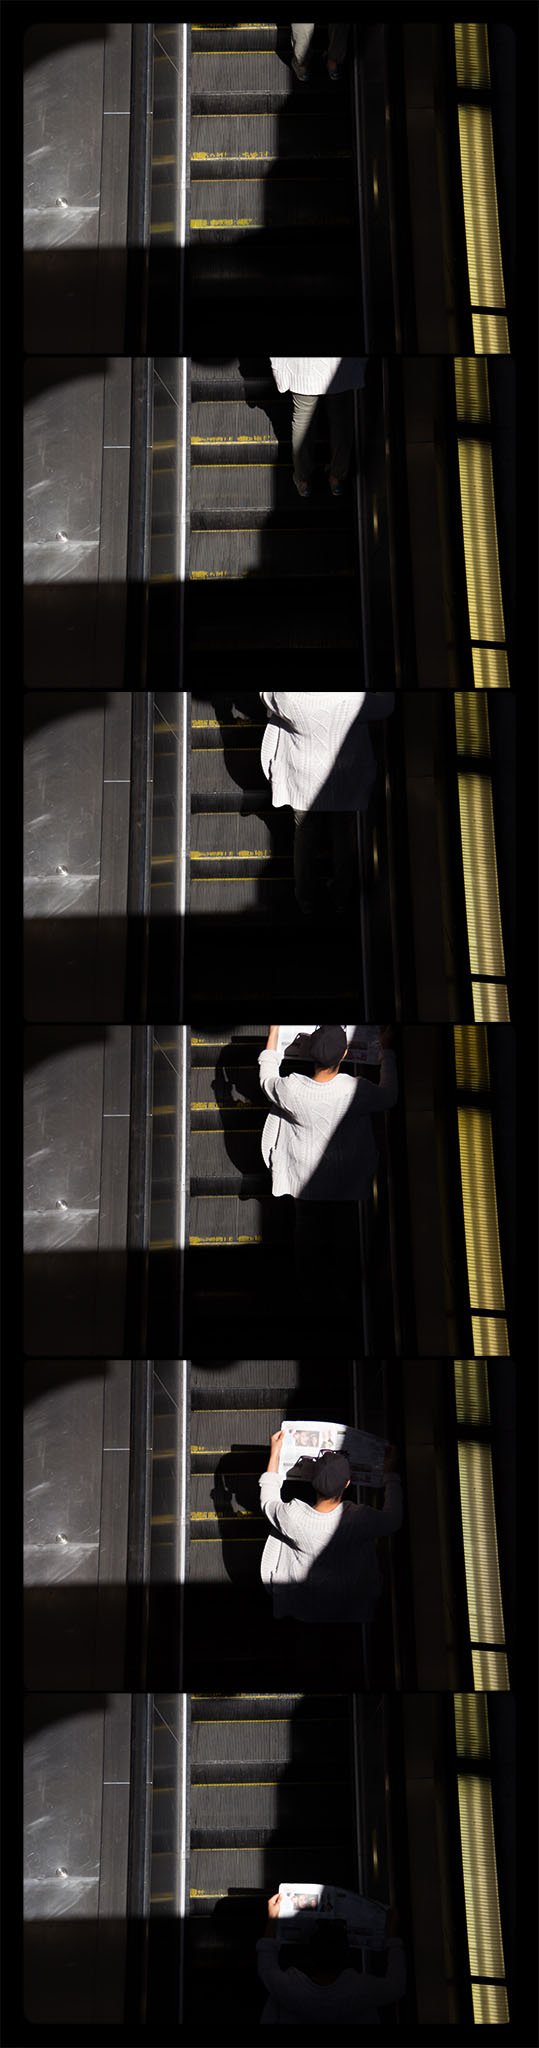 Metro Rail, Gallery Place, Chinatown, 4-21-2012-5785-5793